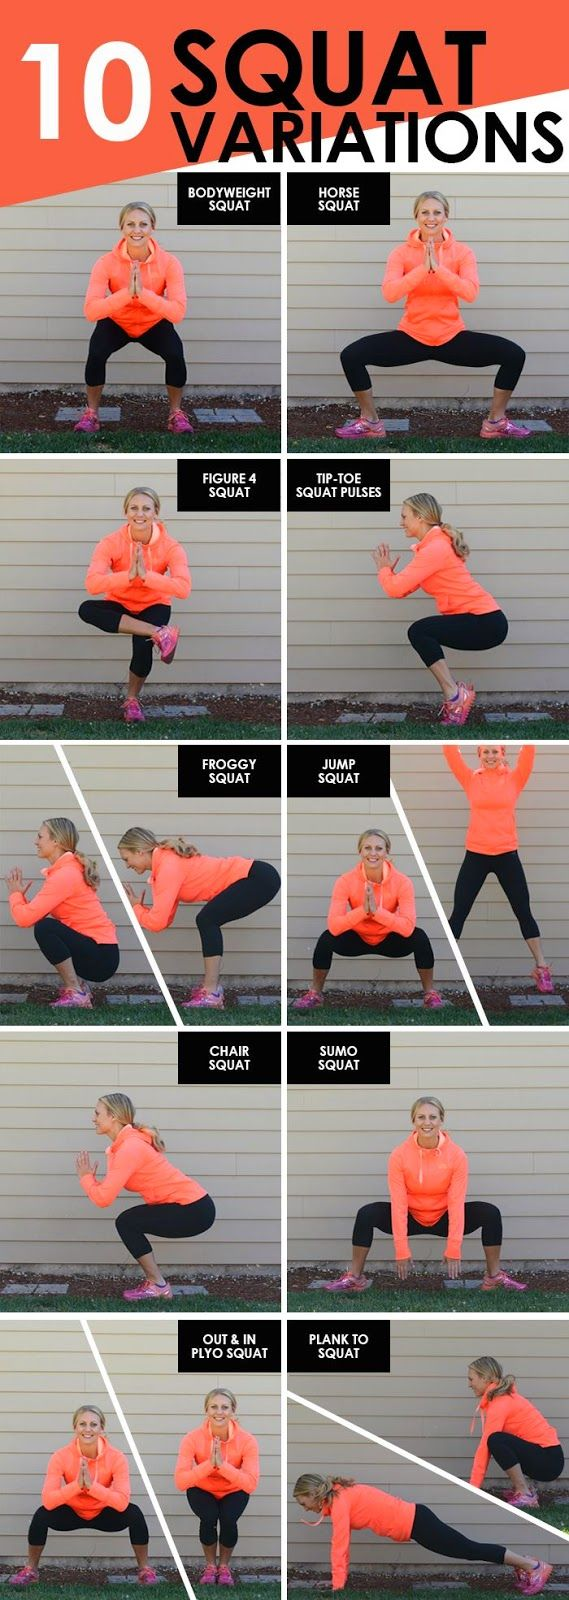 10 Squat Variations + The Northface Mountain Athletics Gear | Fitnezready